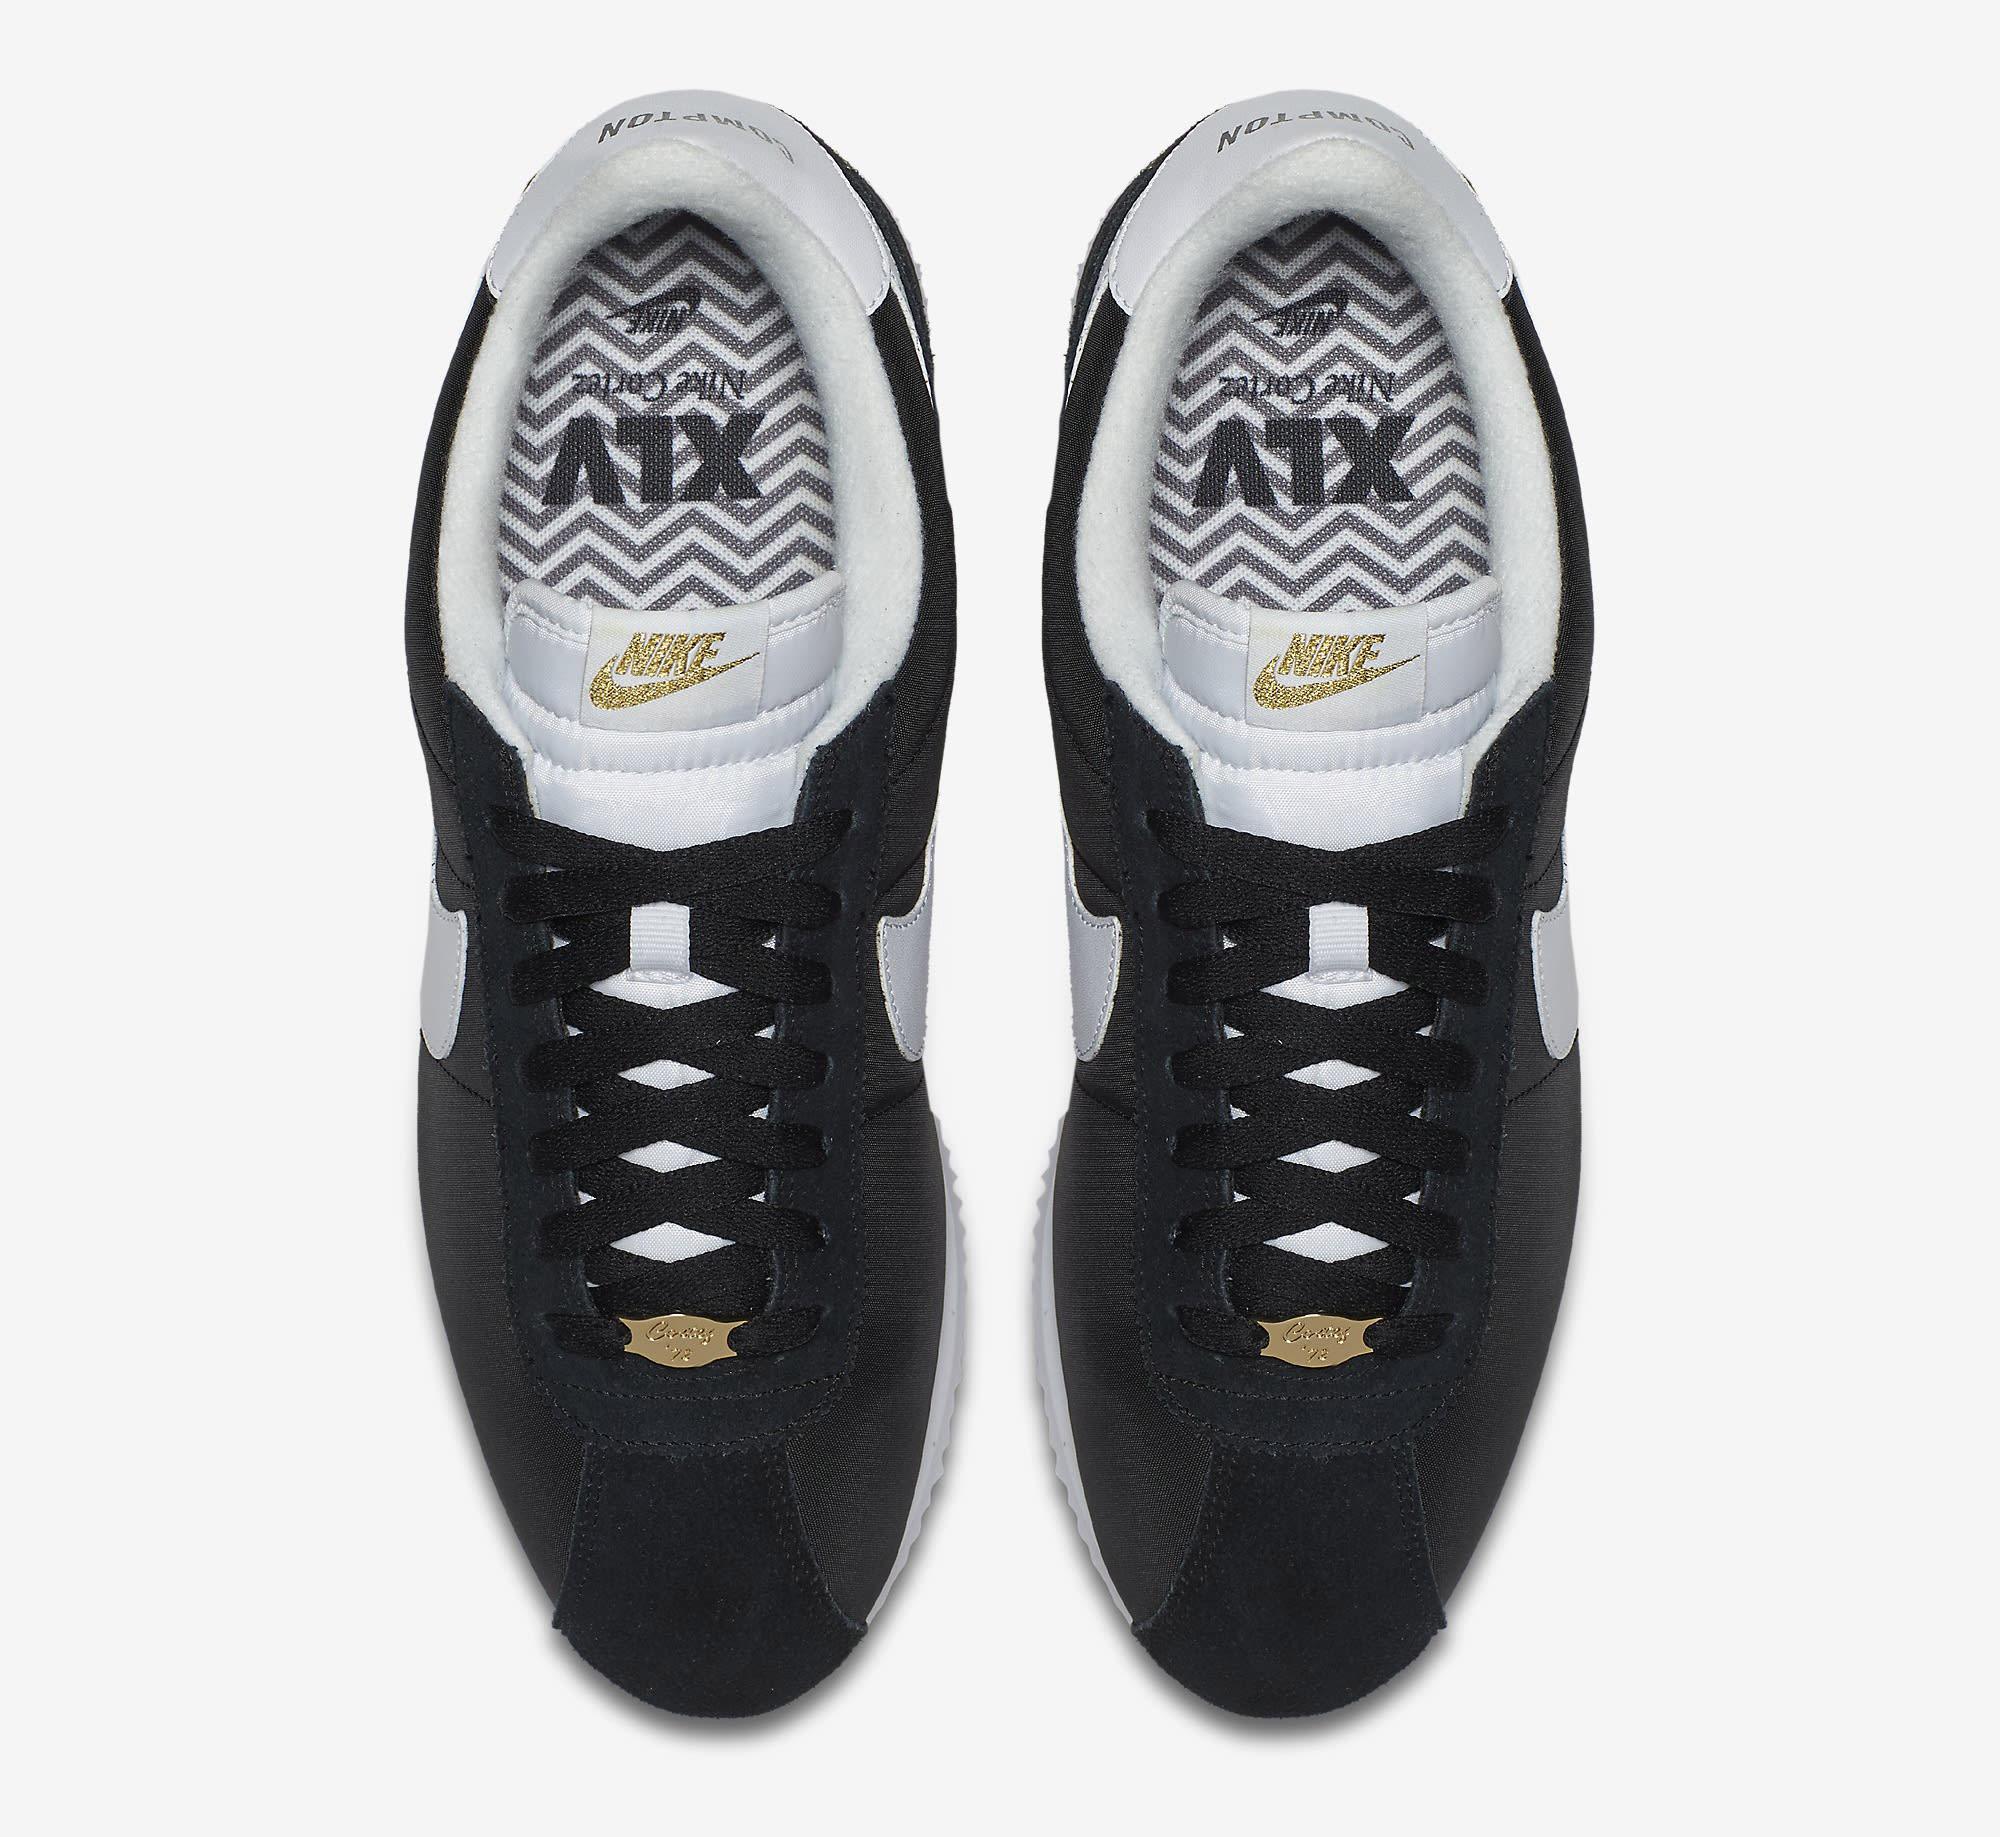 brand new 123c5 604d6 ... Image via Nike Nike Cortez Compton 902804-001 Top ...